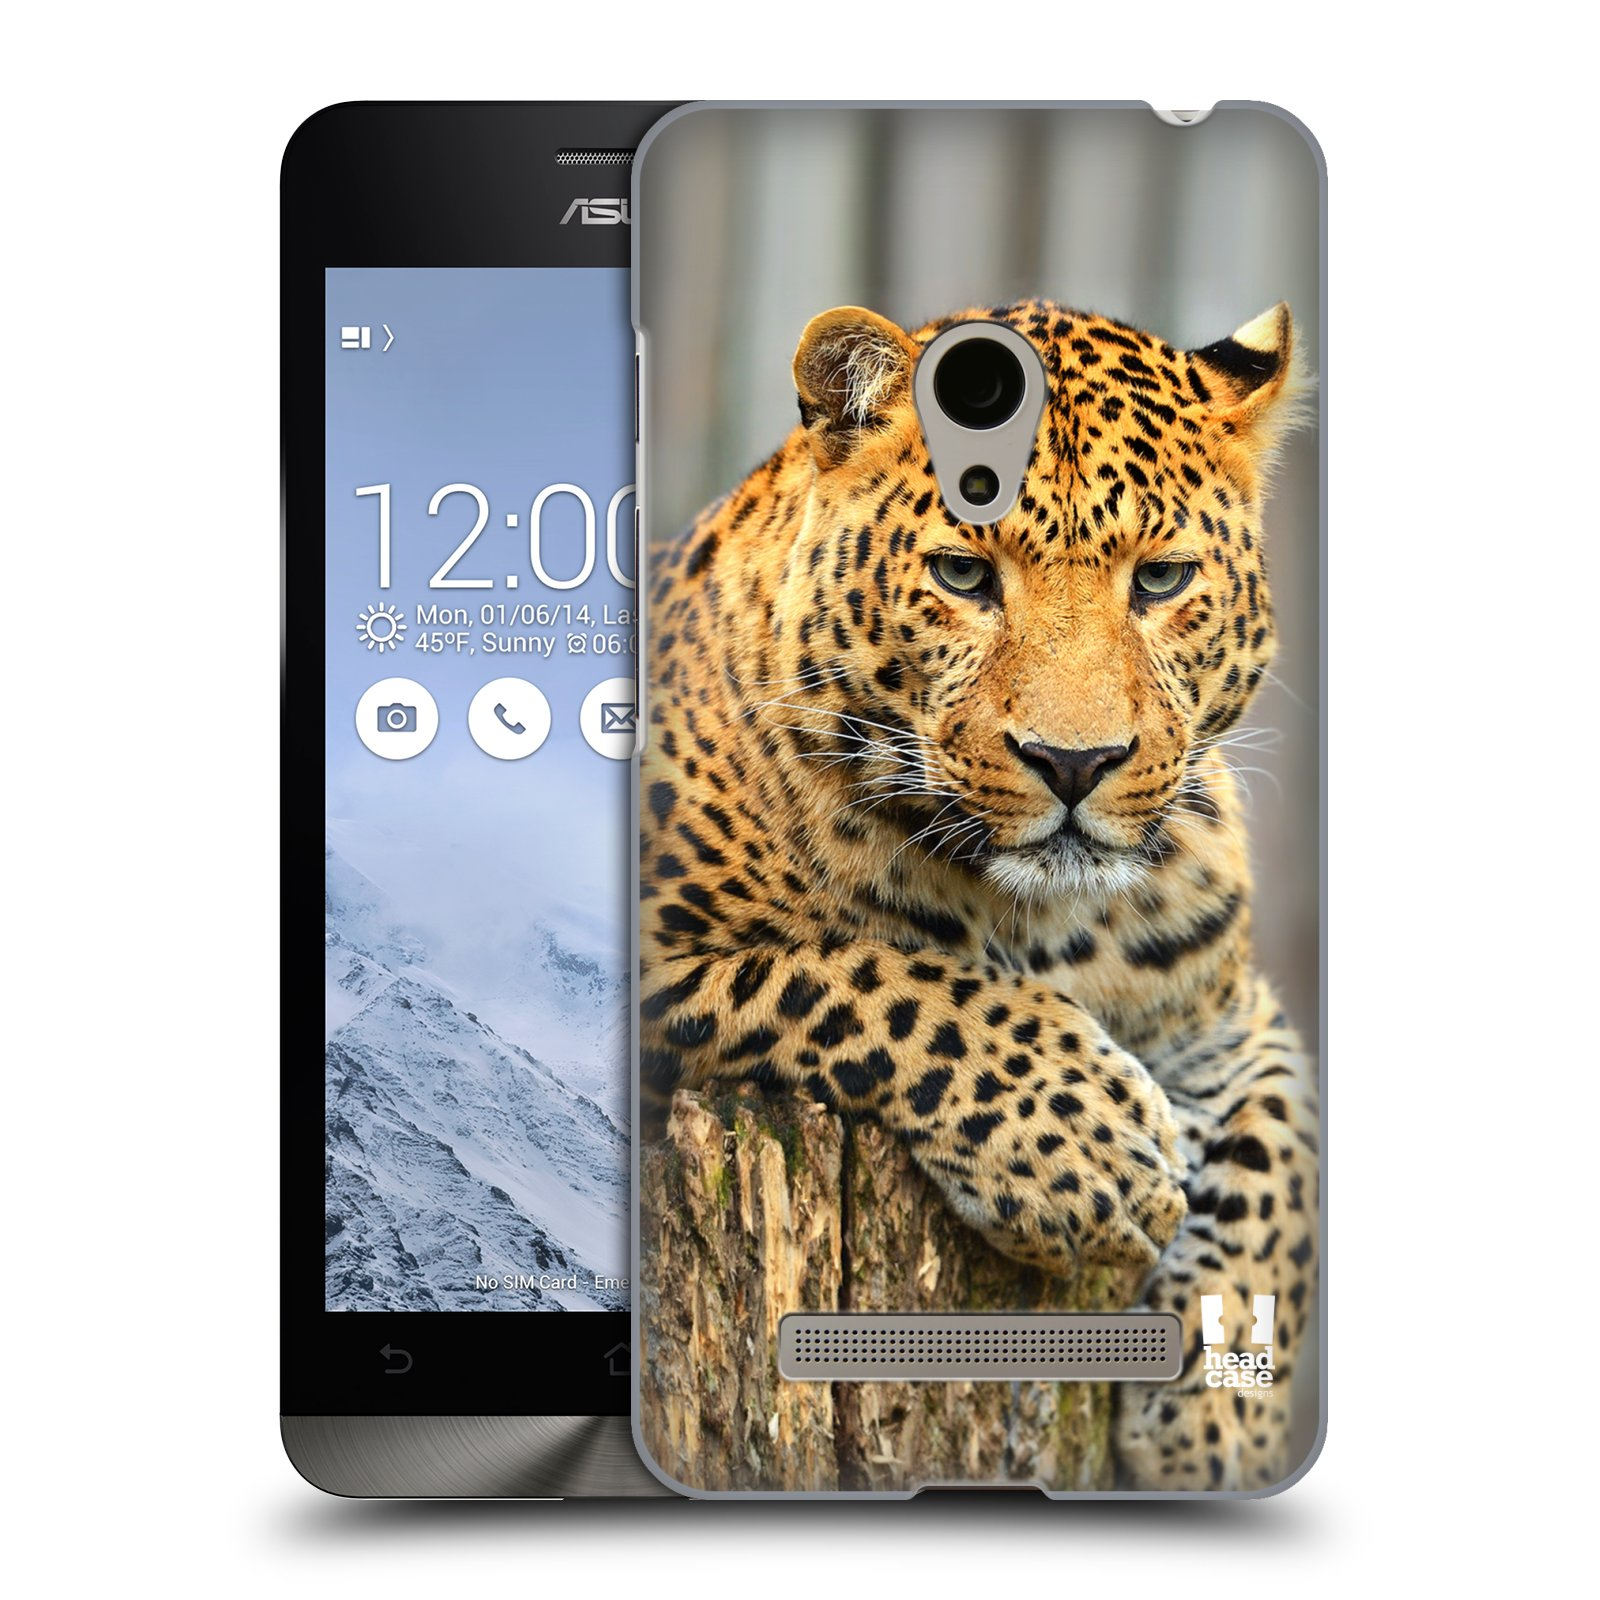 HEAD CASE plastový obal na mobil Asus Zenfone 5 vzor Divočina, Divoký život a zvířata foto LEOPARD PORTRÉT